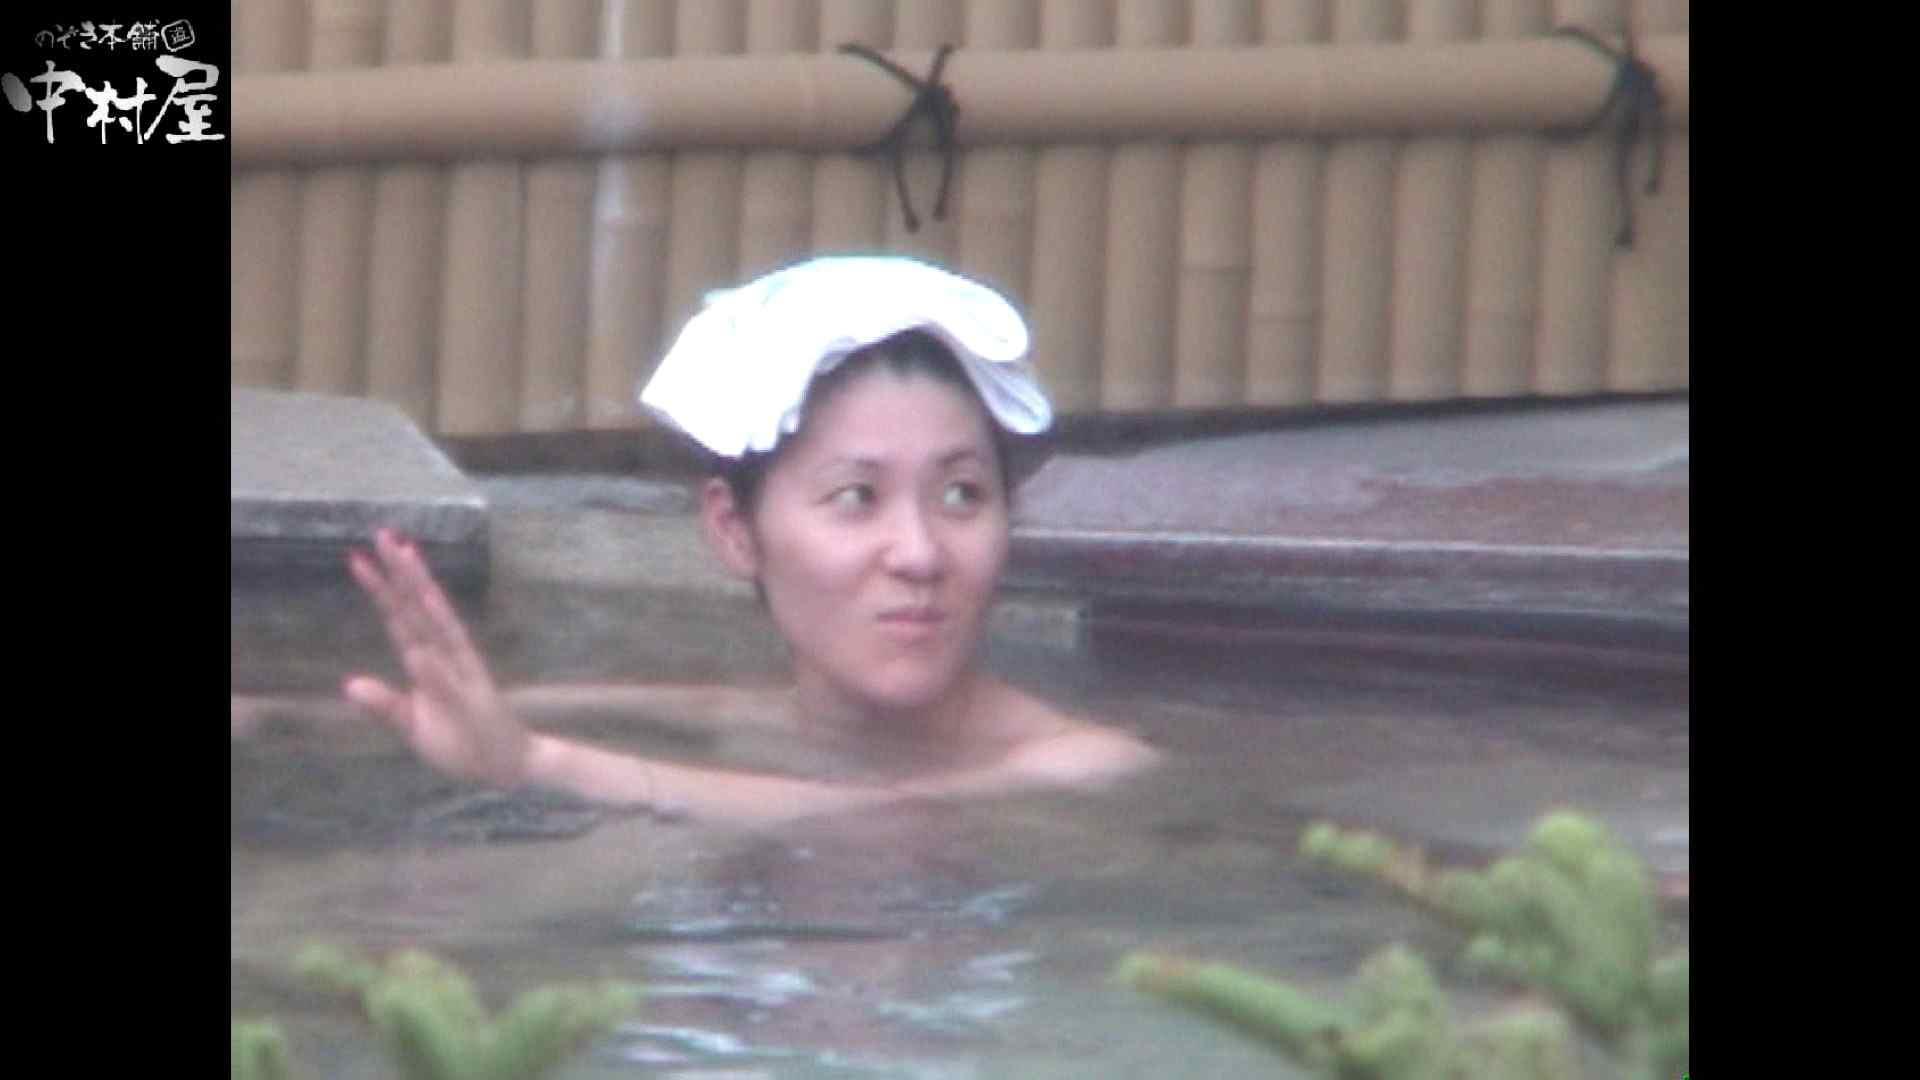 Aquaな露天風呂Vol.925 盗撮   HなOL  104pic 100